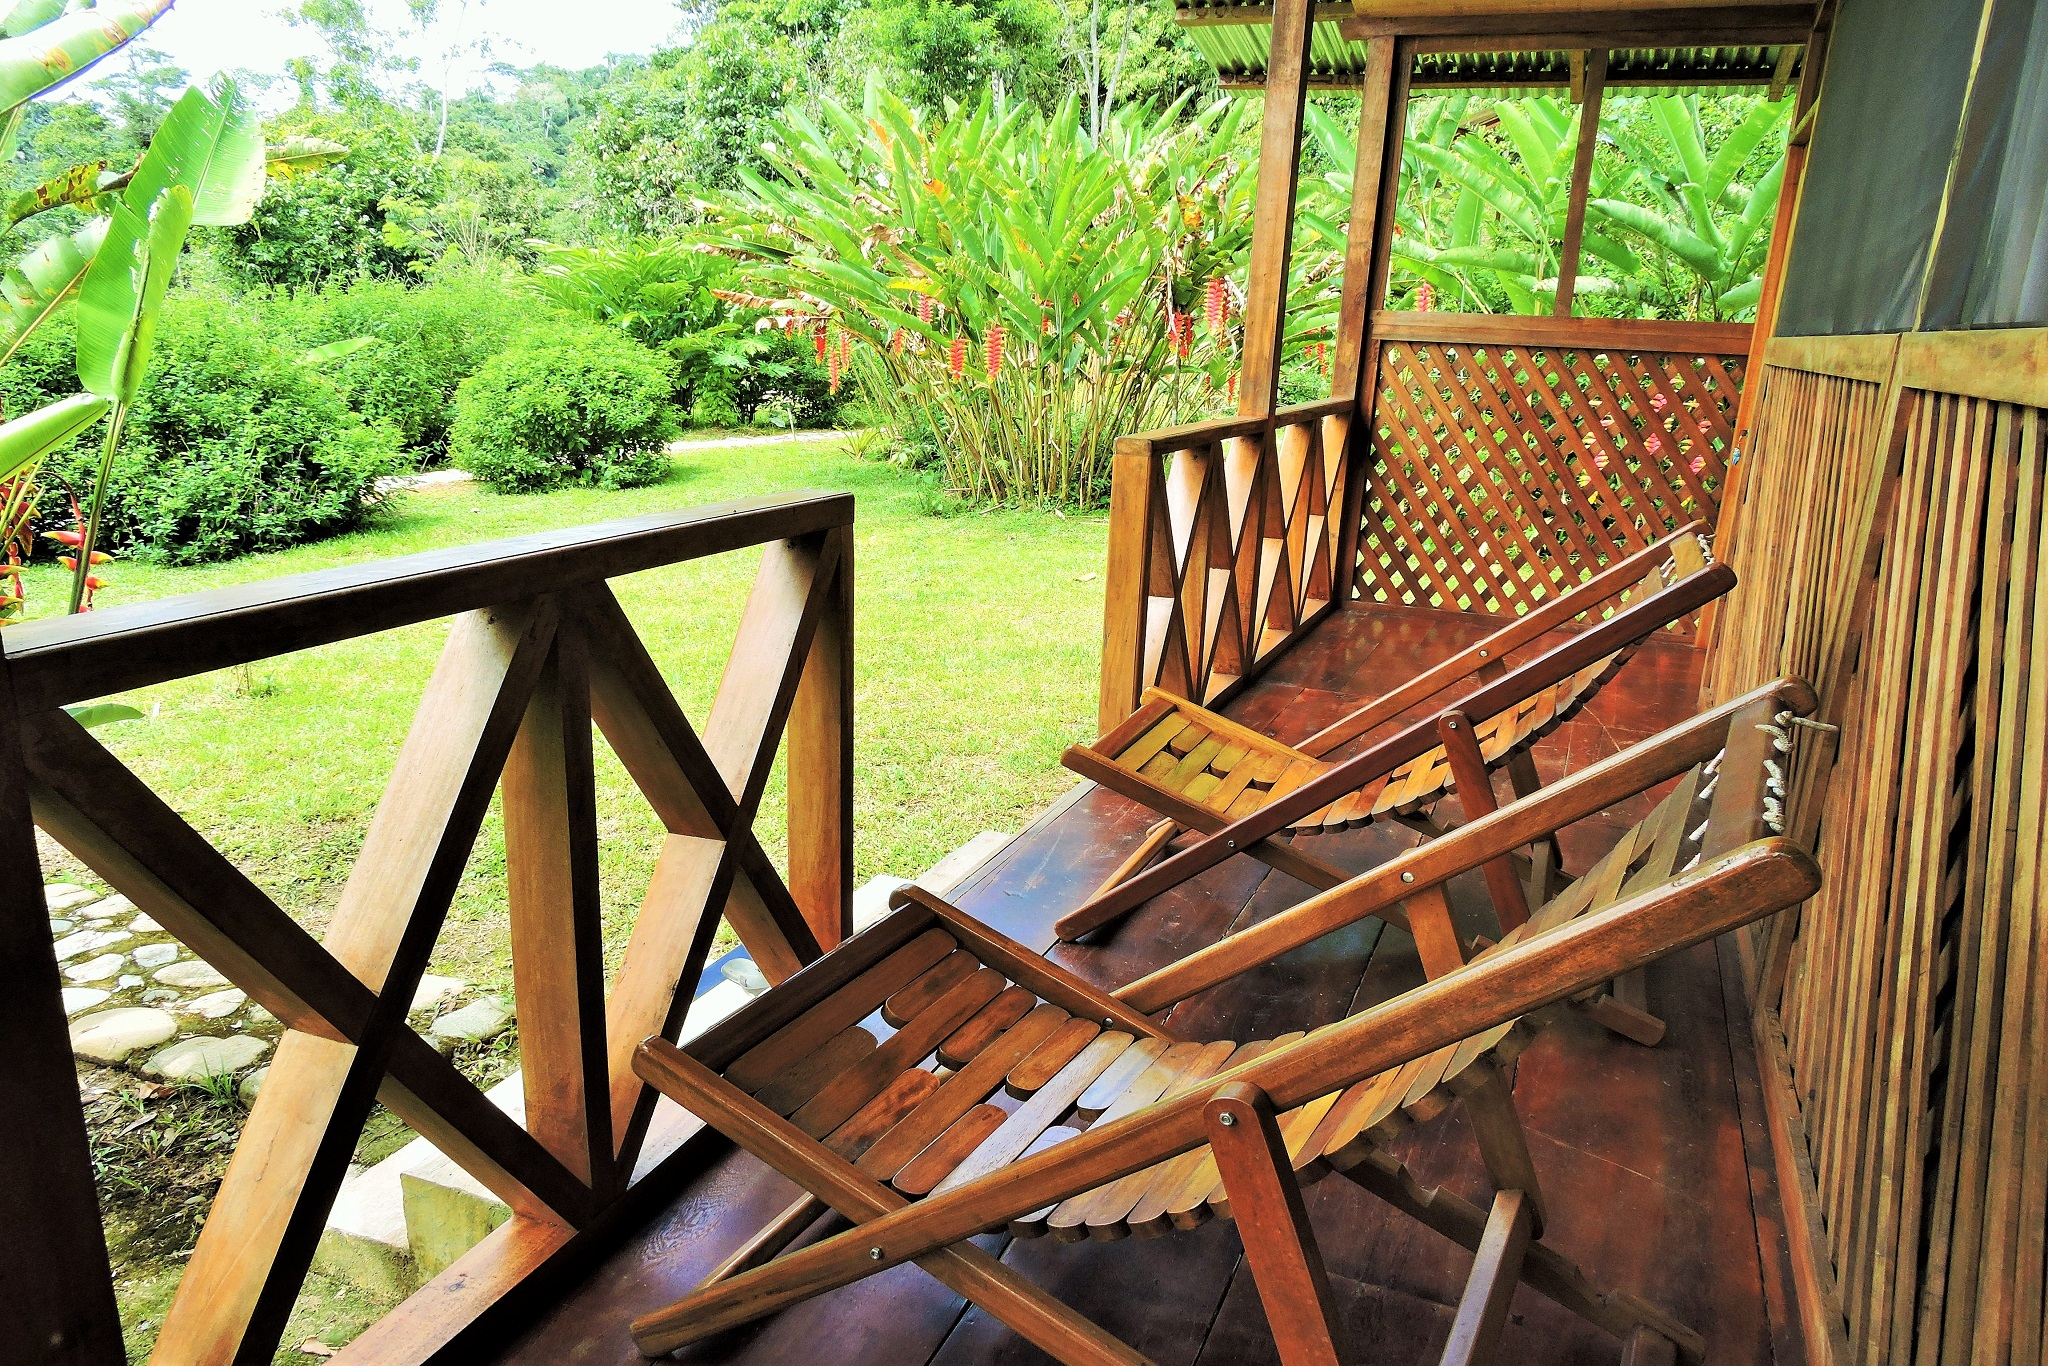 https://www.wildwatchperu.com/wp-content/uploads/2019/04/Guadalupe-Lodge-Garden-seats.jpg